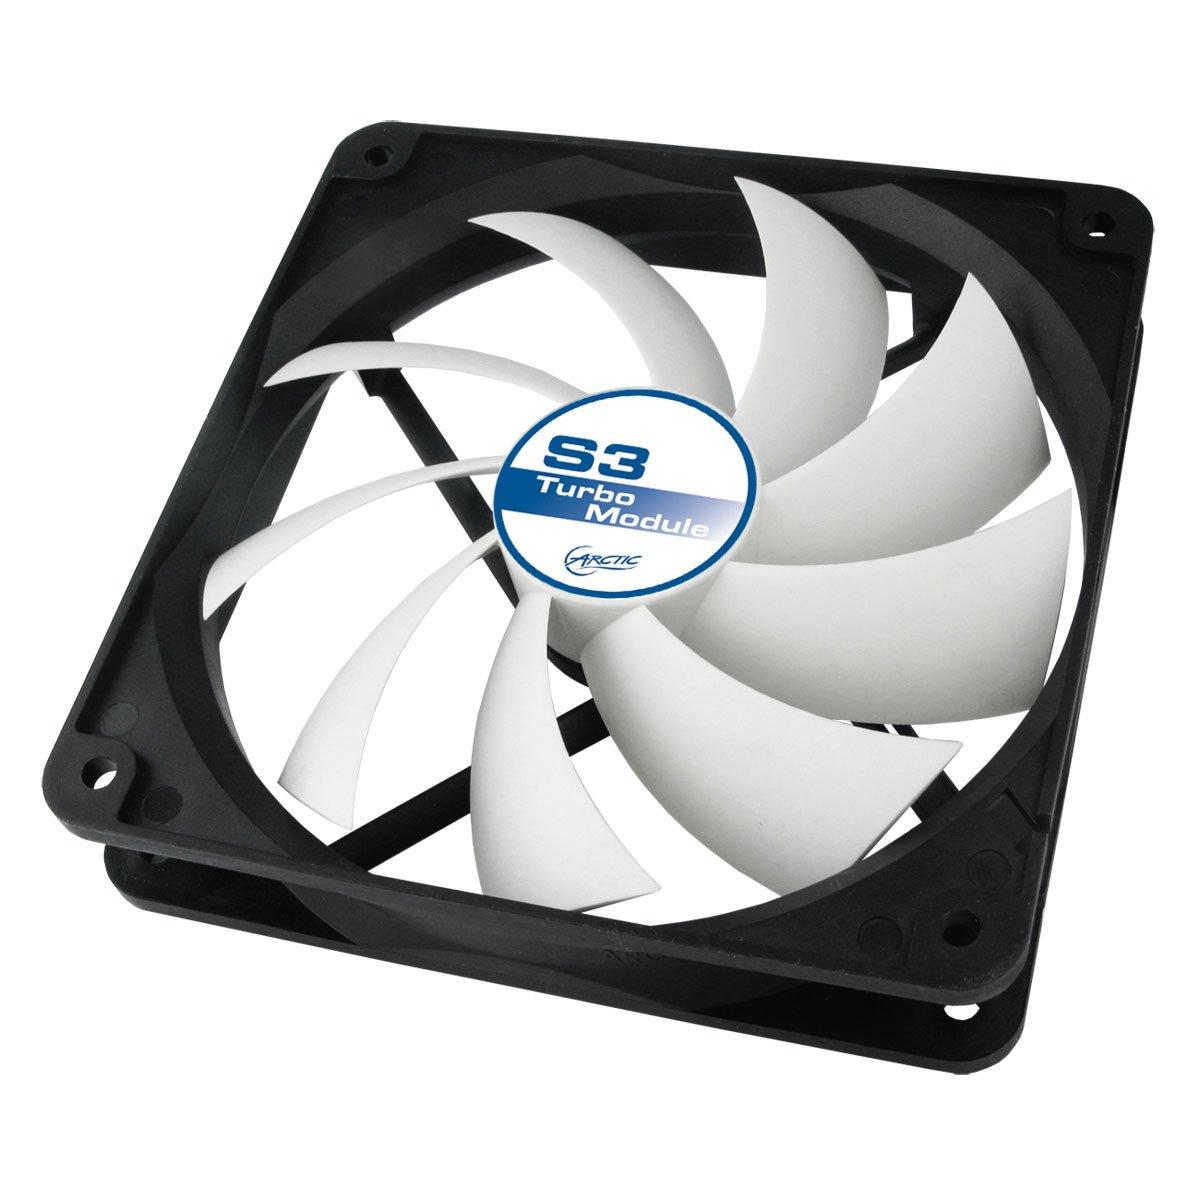 Cooler Fan para Accelero S3 – 120 mm Fan for Increasing The